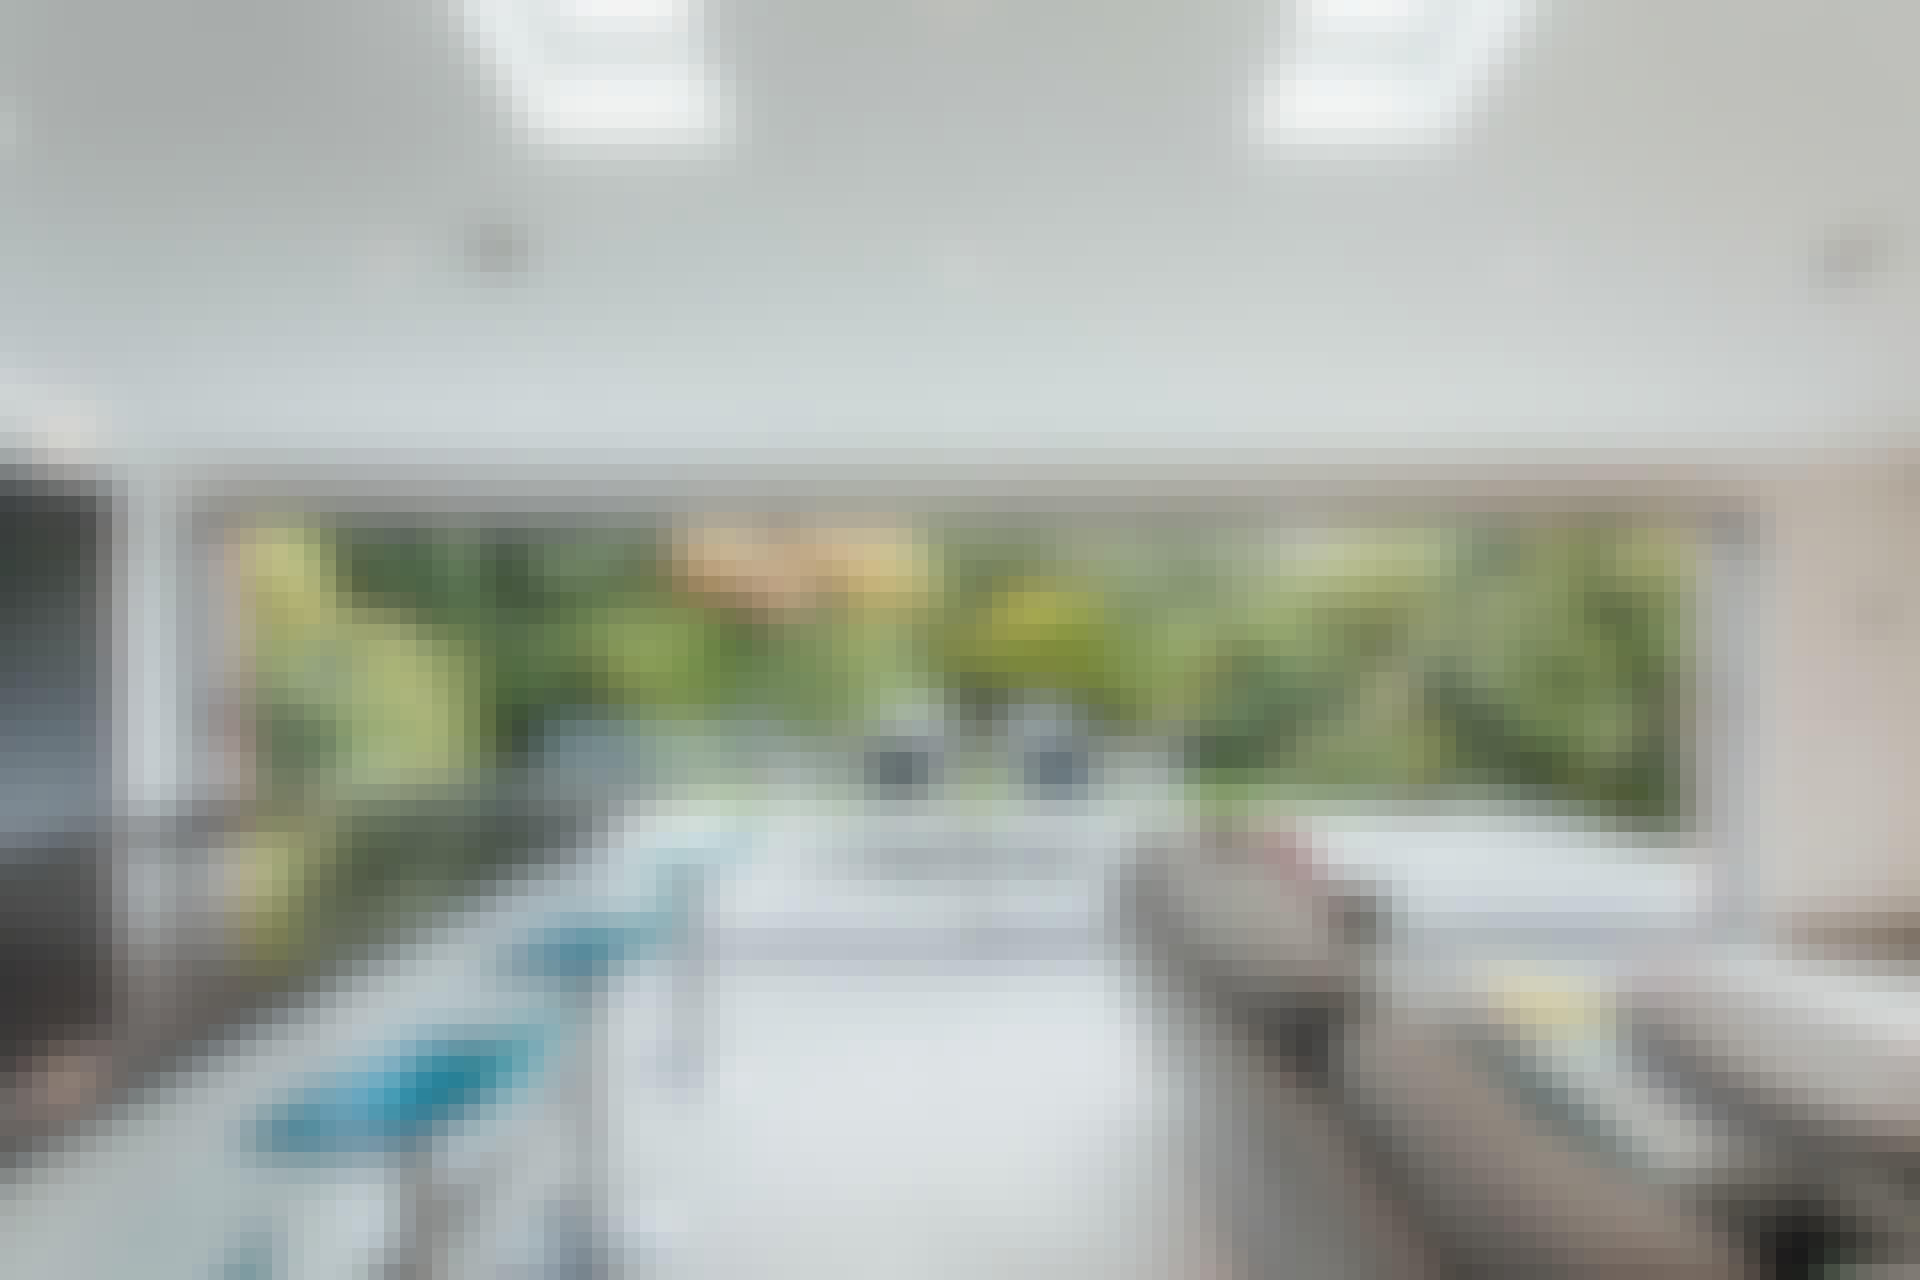 minimal framed sliding glass walls in living room for a modern makeover